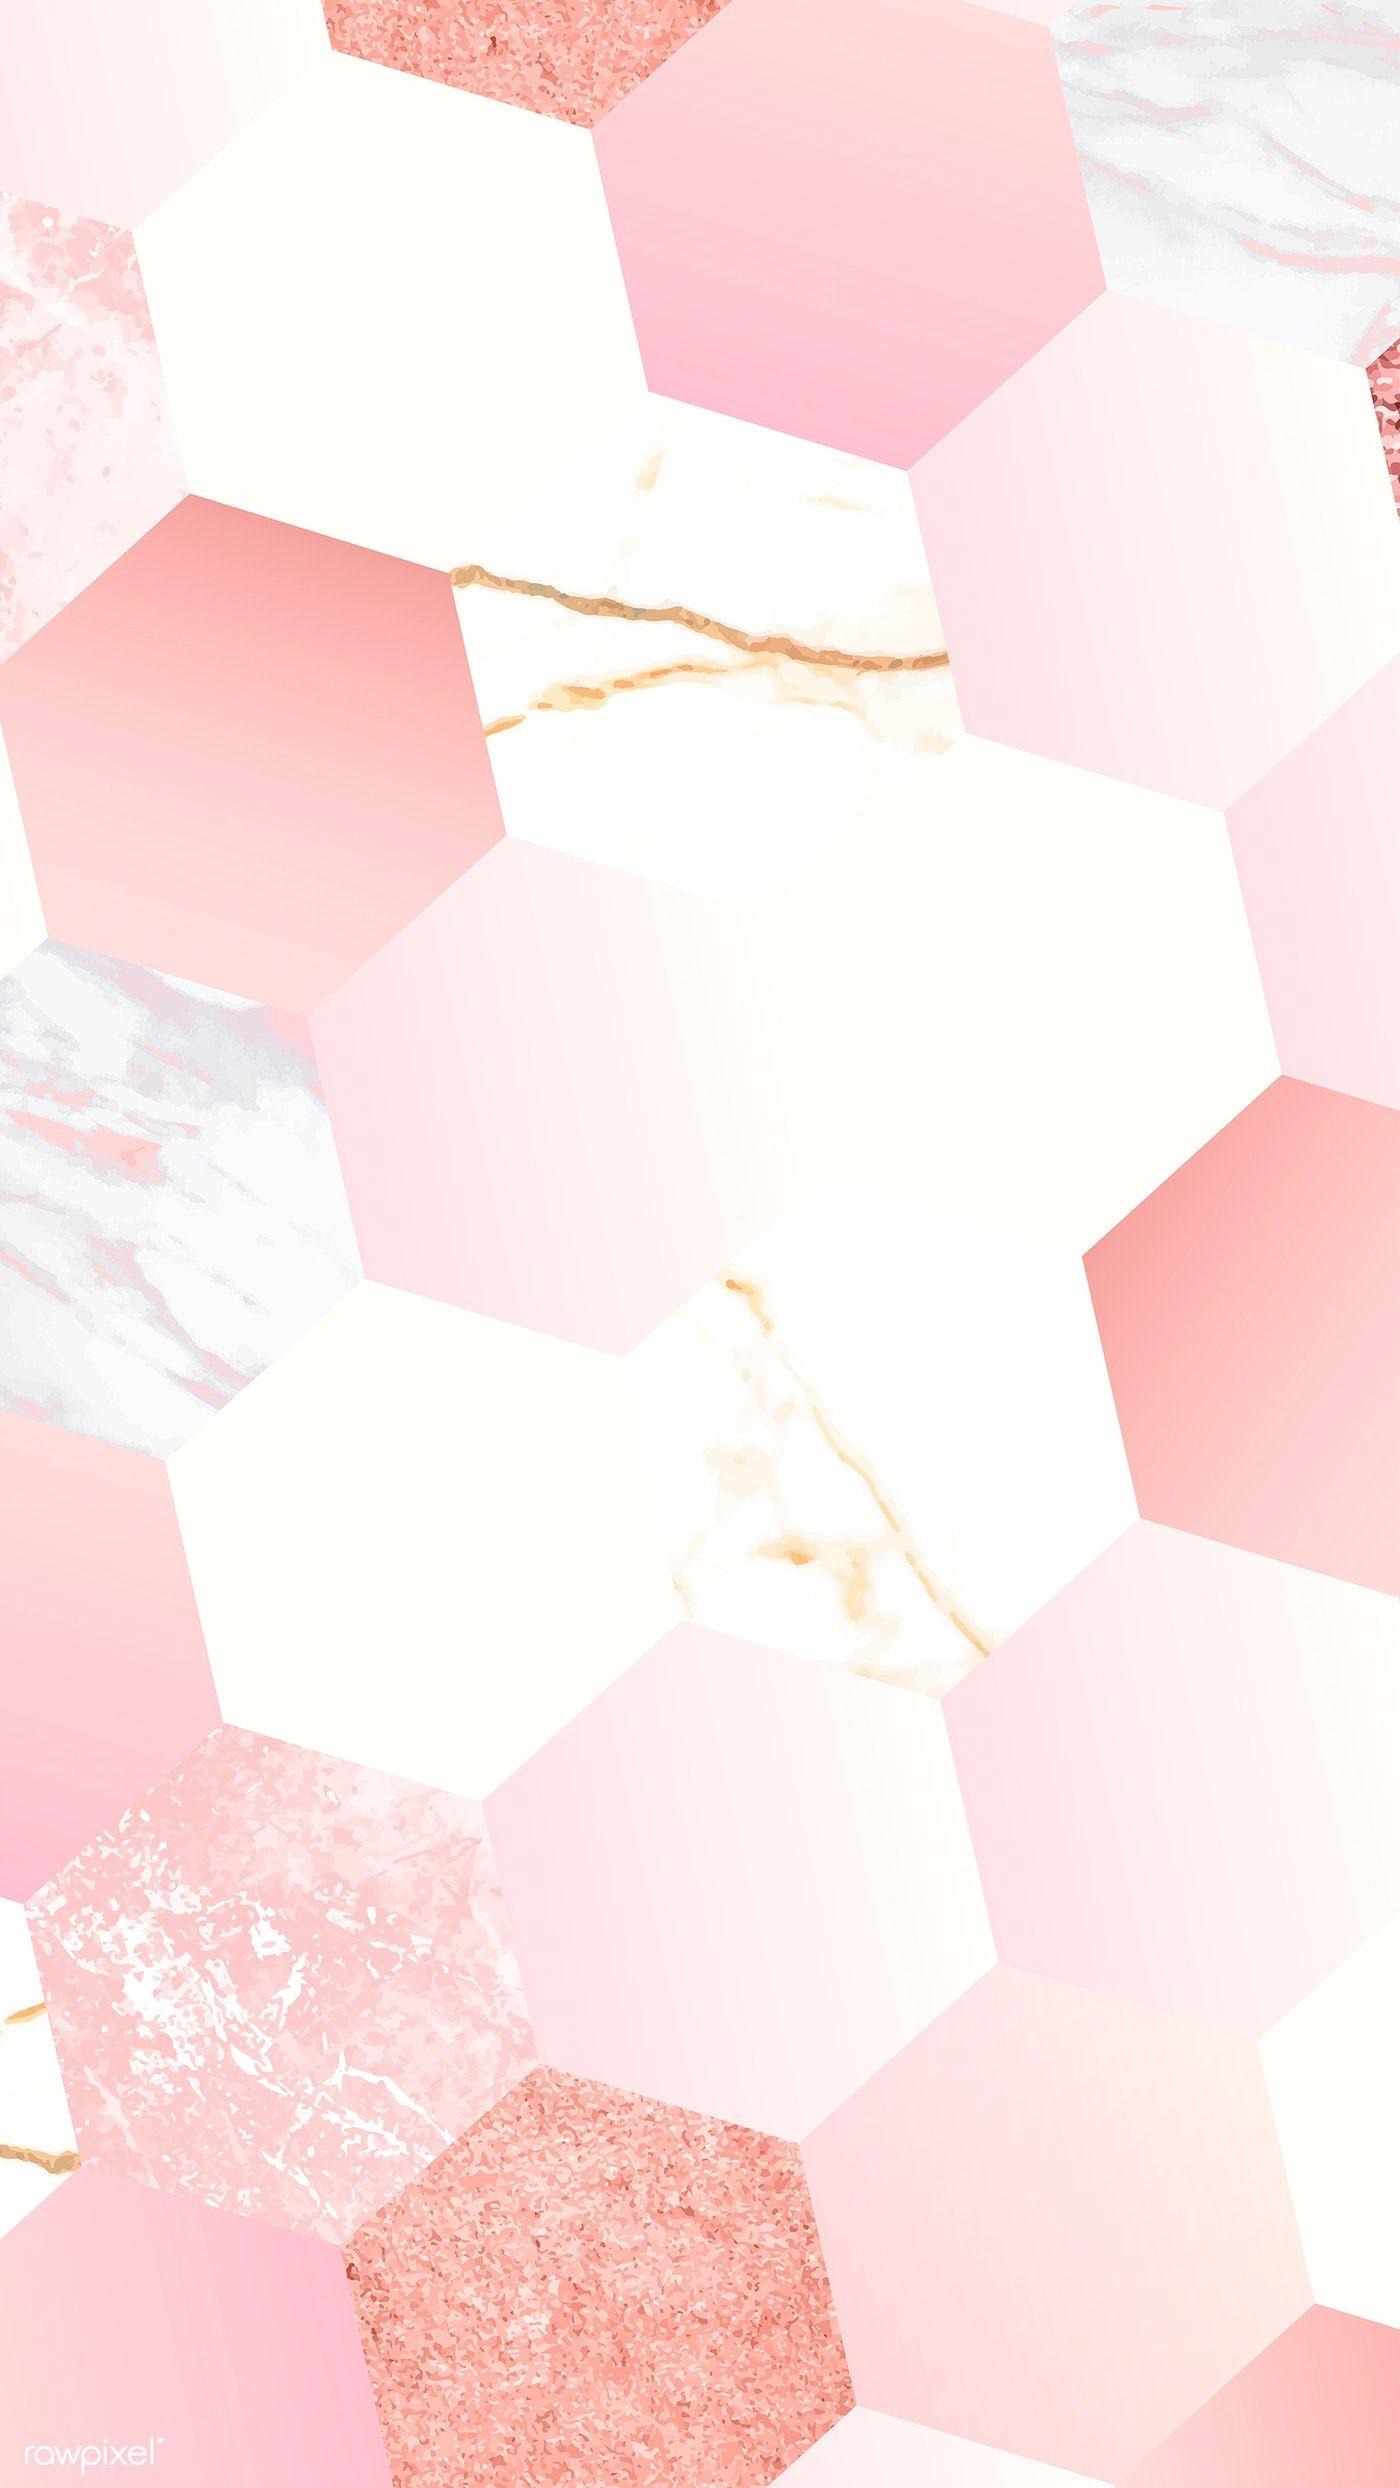 Pink Feminine Hexagon Geometric Background Vector Free Image By Rawpixel Com Niwat Geometric Background Pink Wallpaper Backgrounds Rose Gold Wallpaper